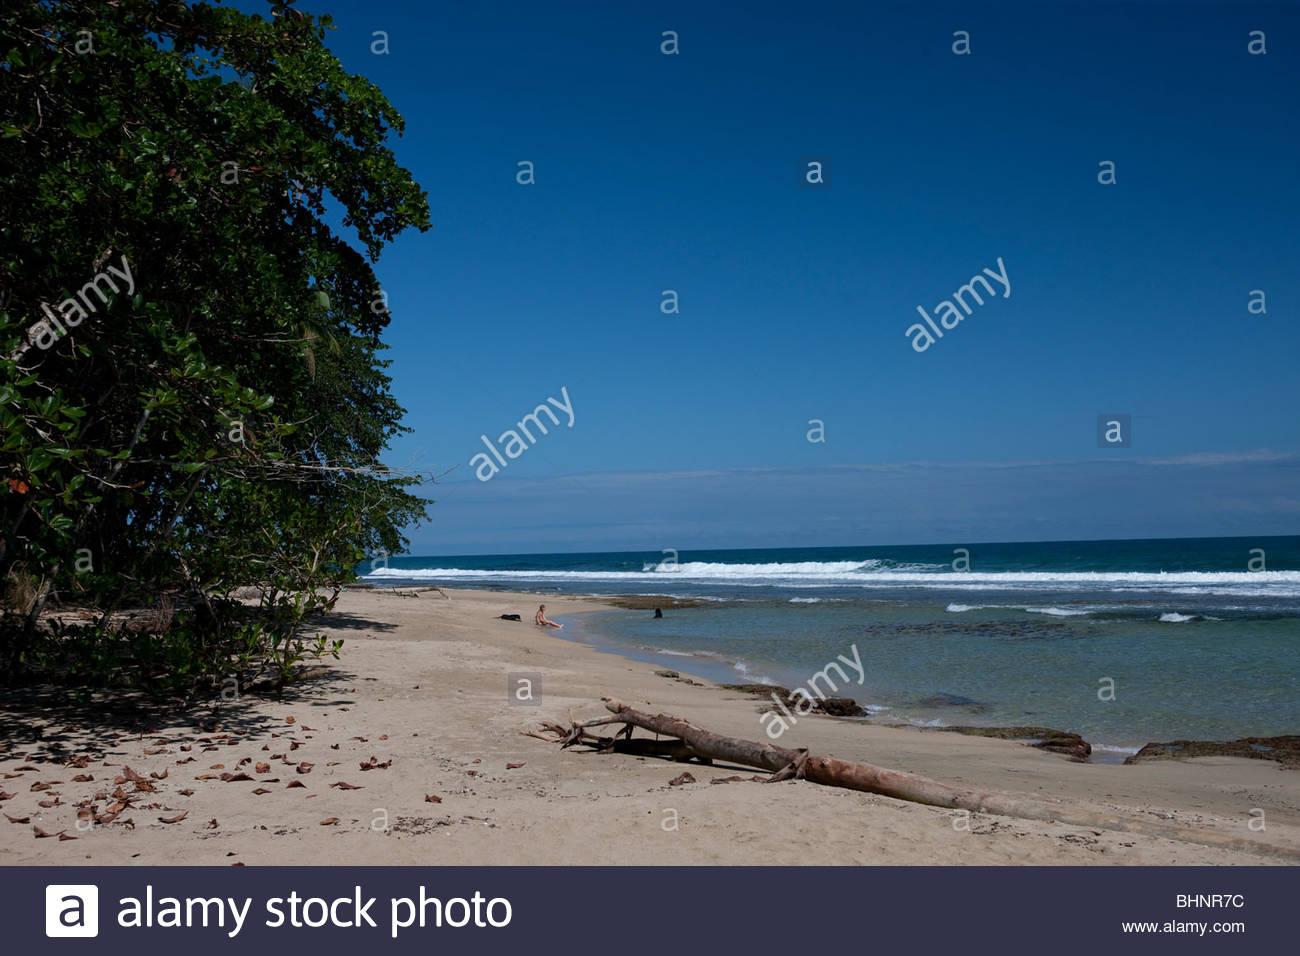 Punta Uva, Costa Rica - Stock Image